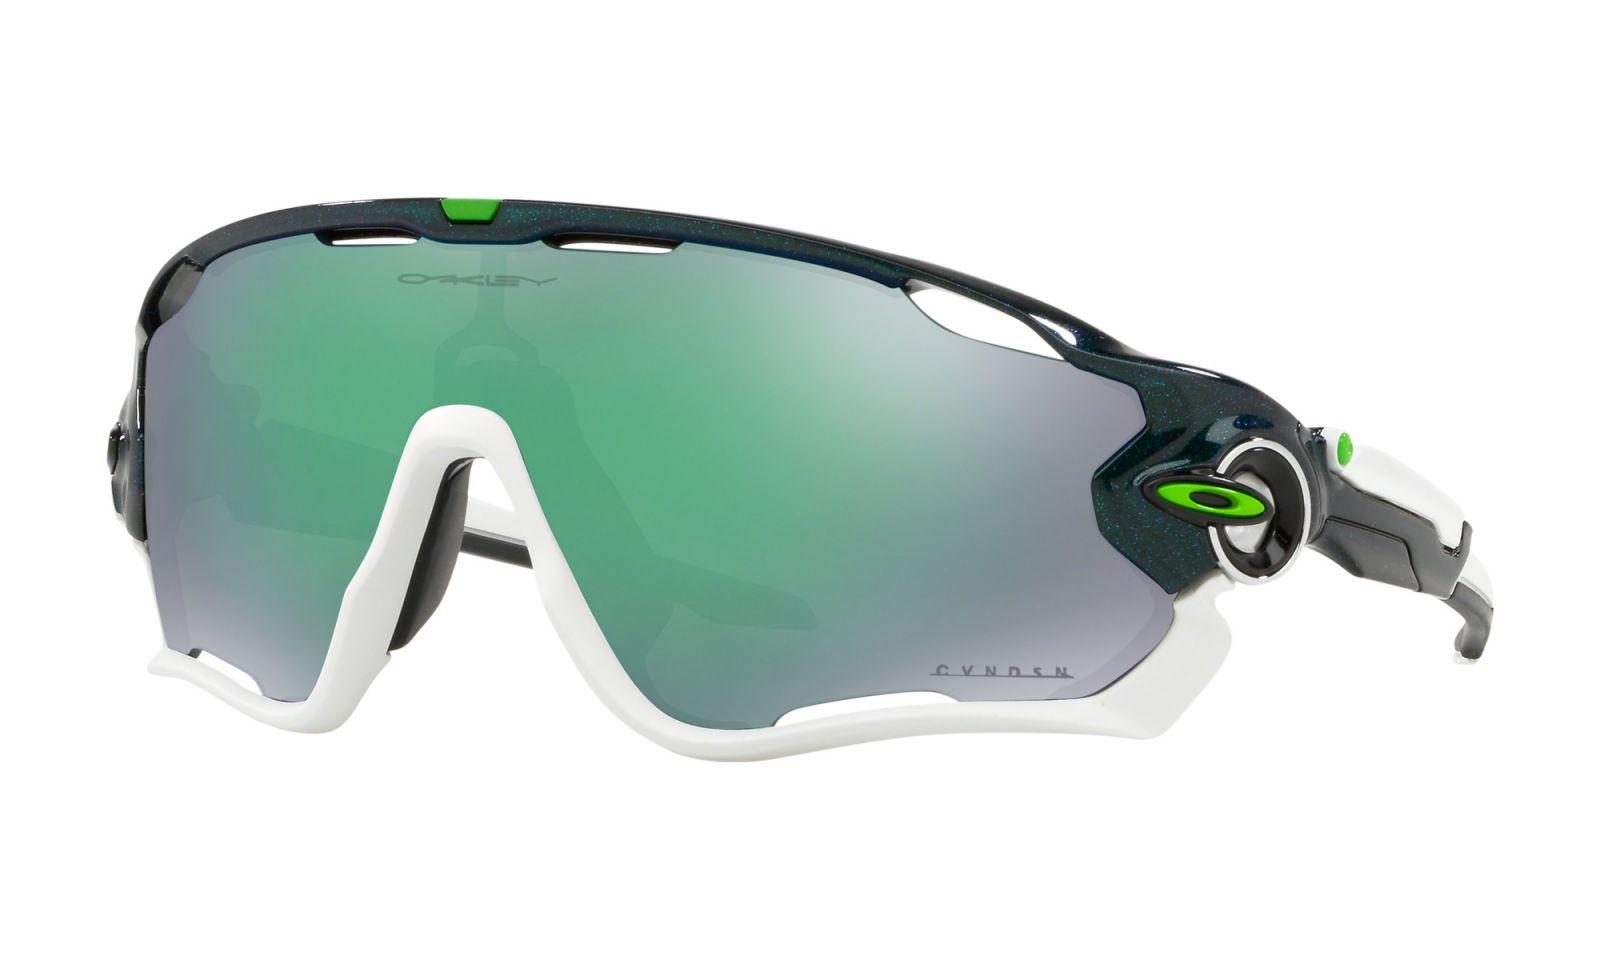 Brýle OAKLEY Jawbreaker Cavendish - Metallic Green/Prizm Jade